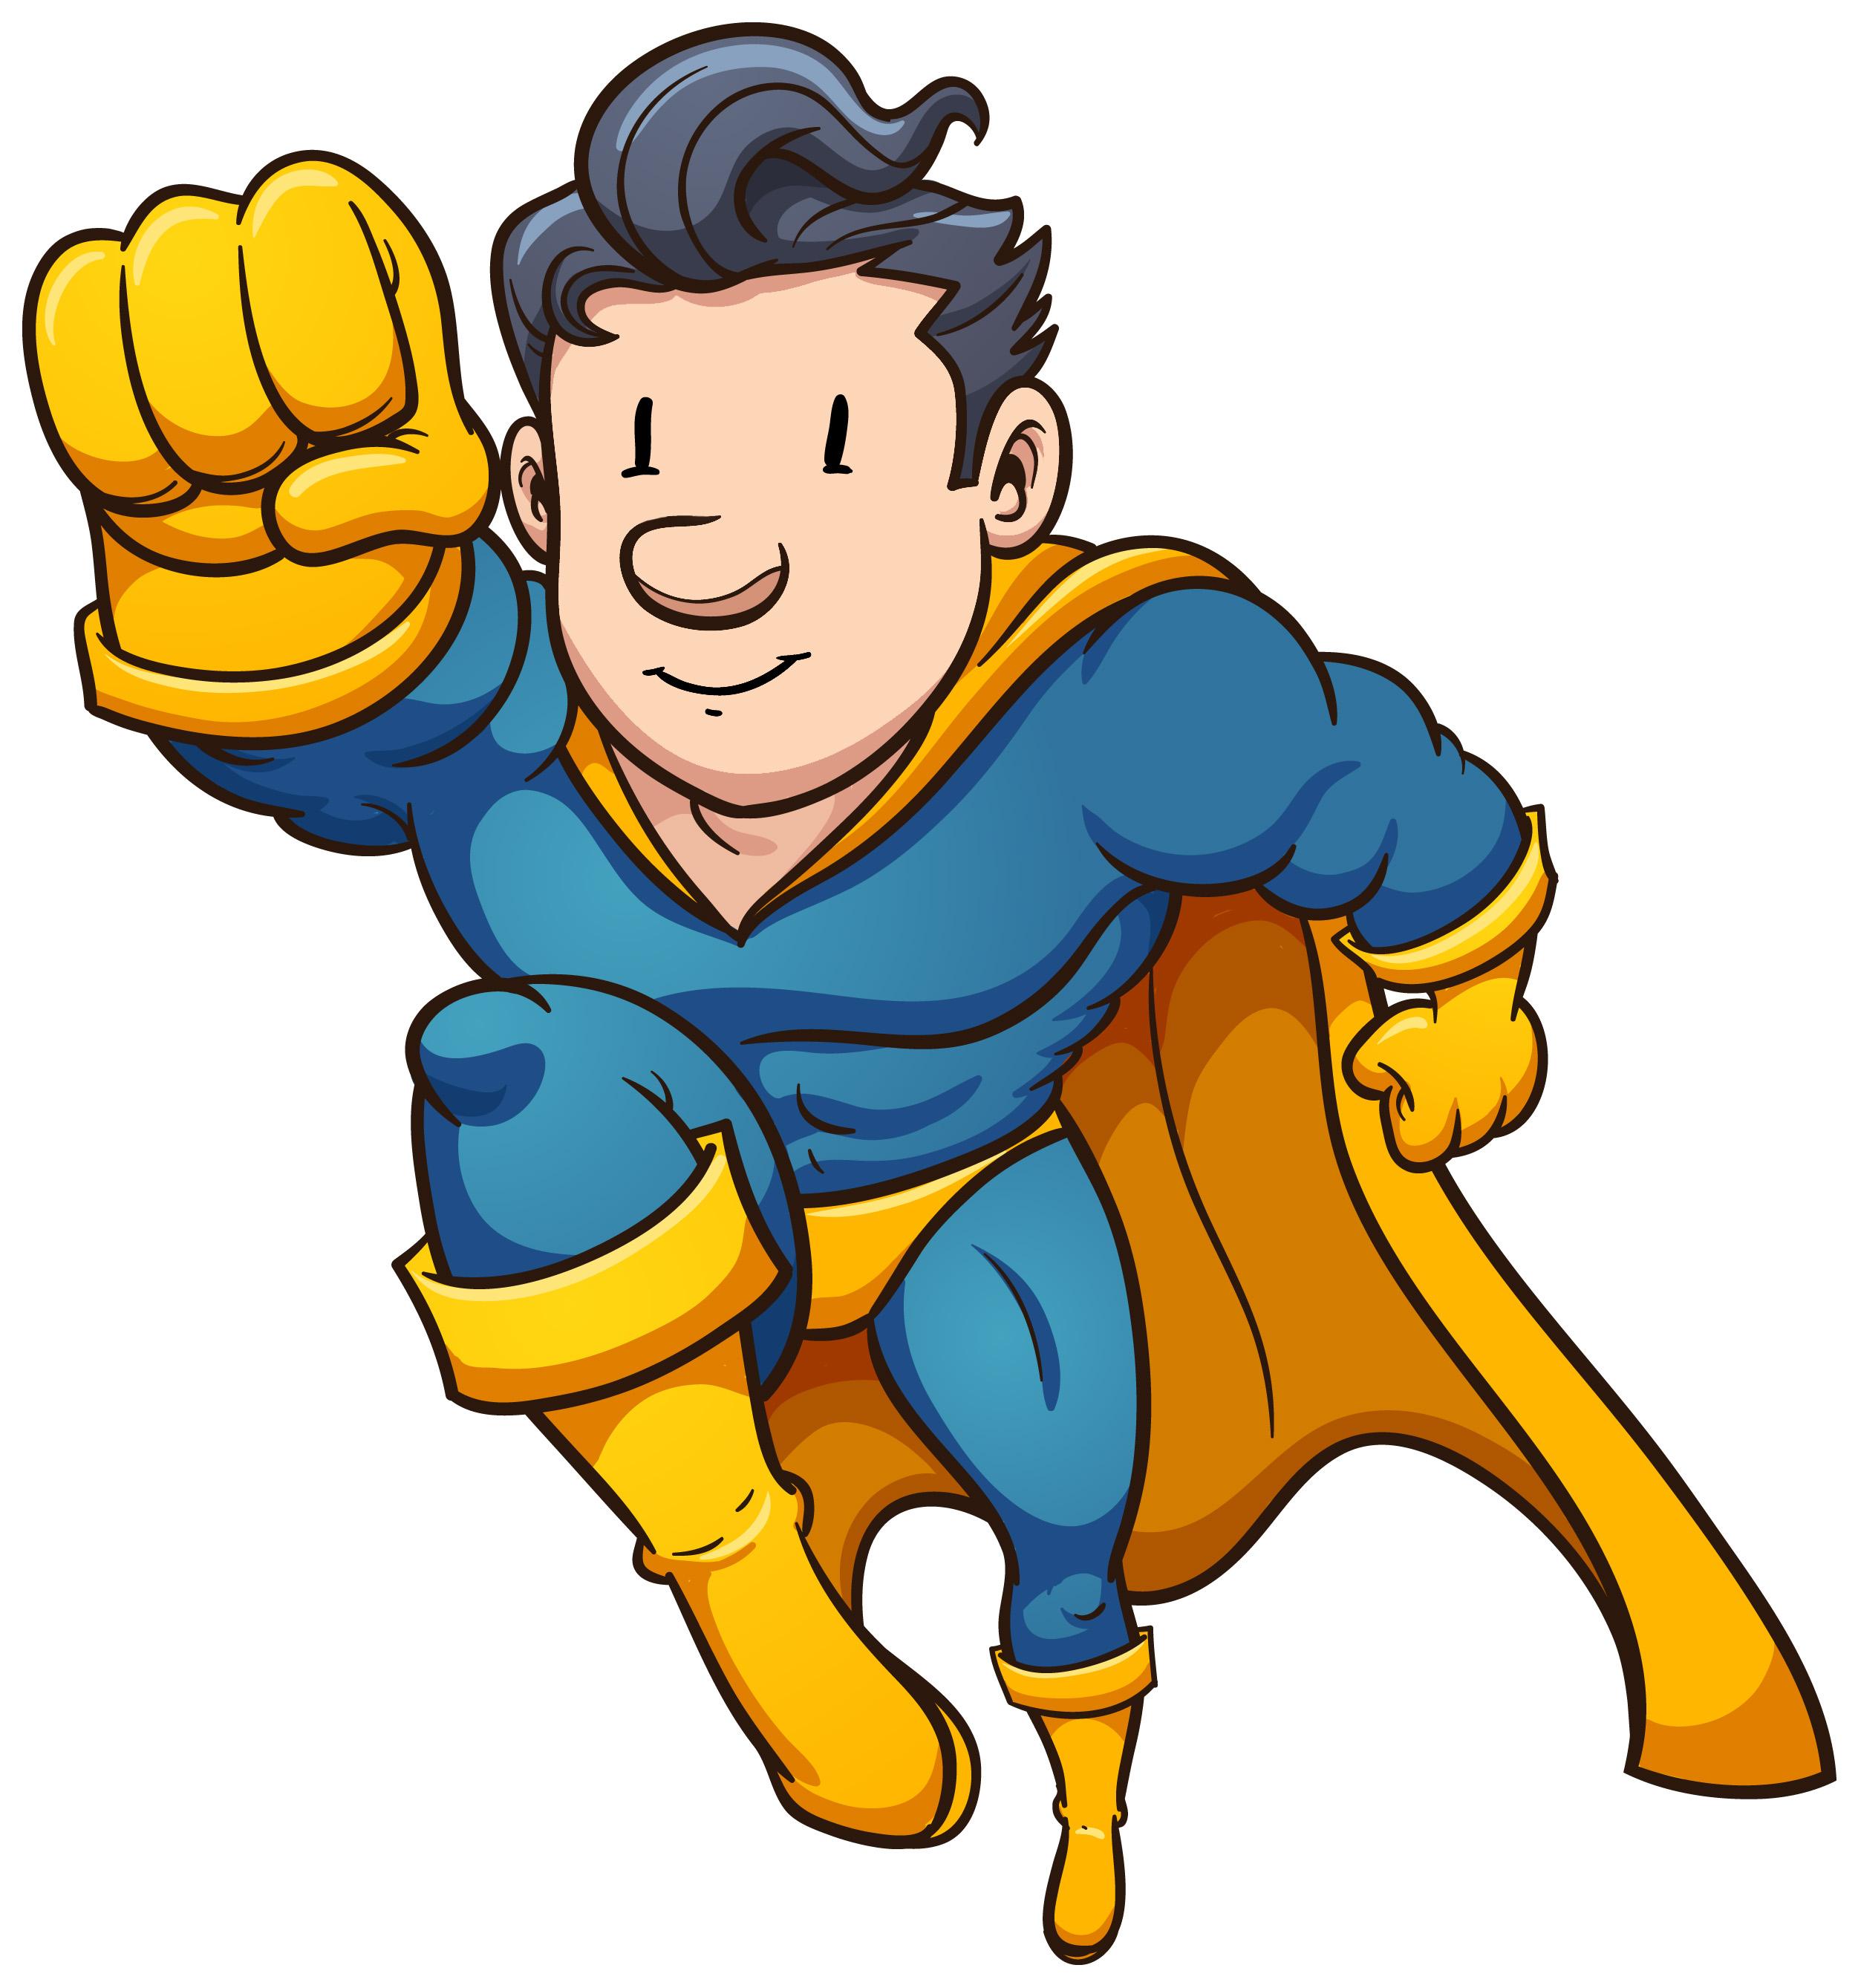 what does my super hero look like nihongo hapani にほんご ハパニ